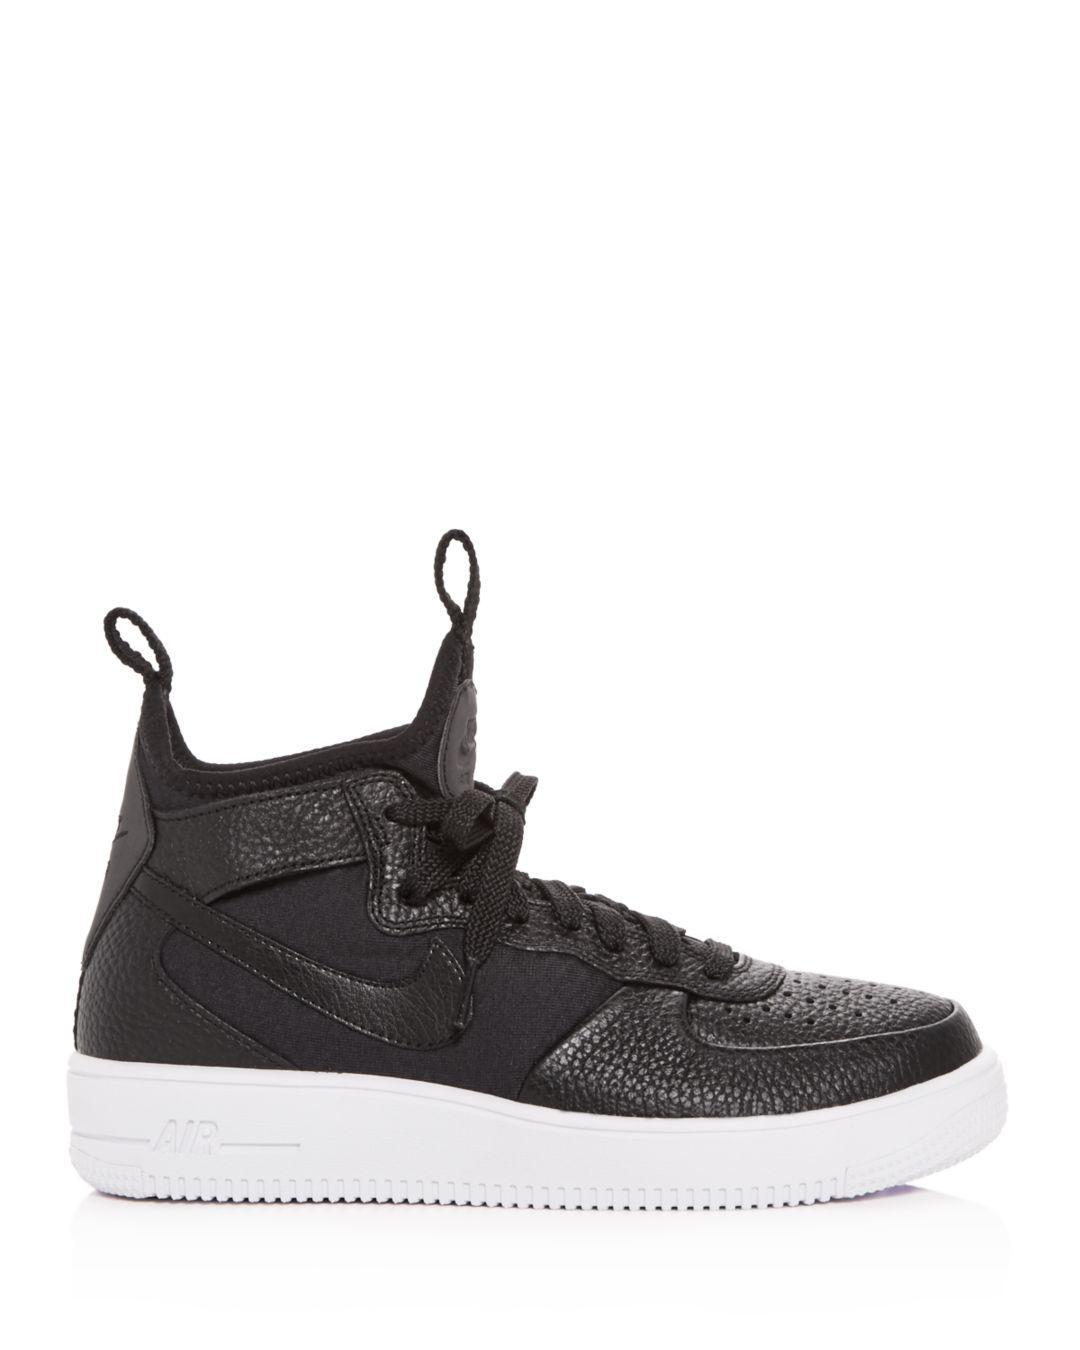 b9ebc789d9f05c Lyst - Nike Women s Air Force 1 Ultraforce Leather Mid Top Sneakers in Black